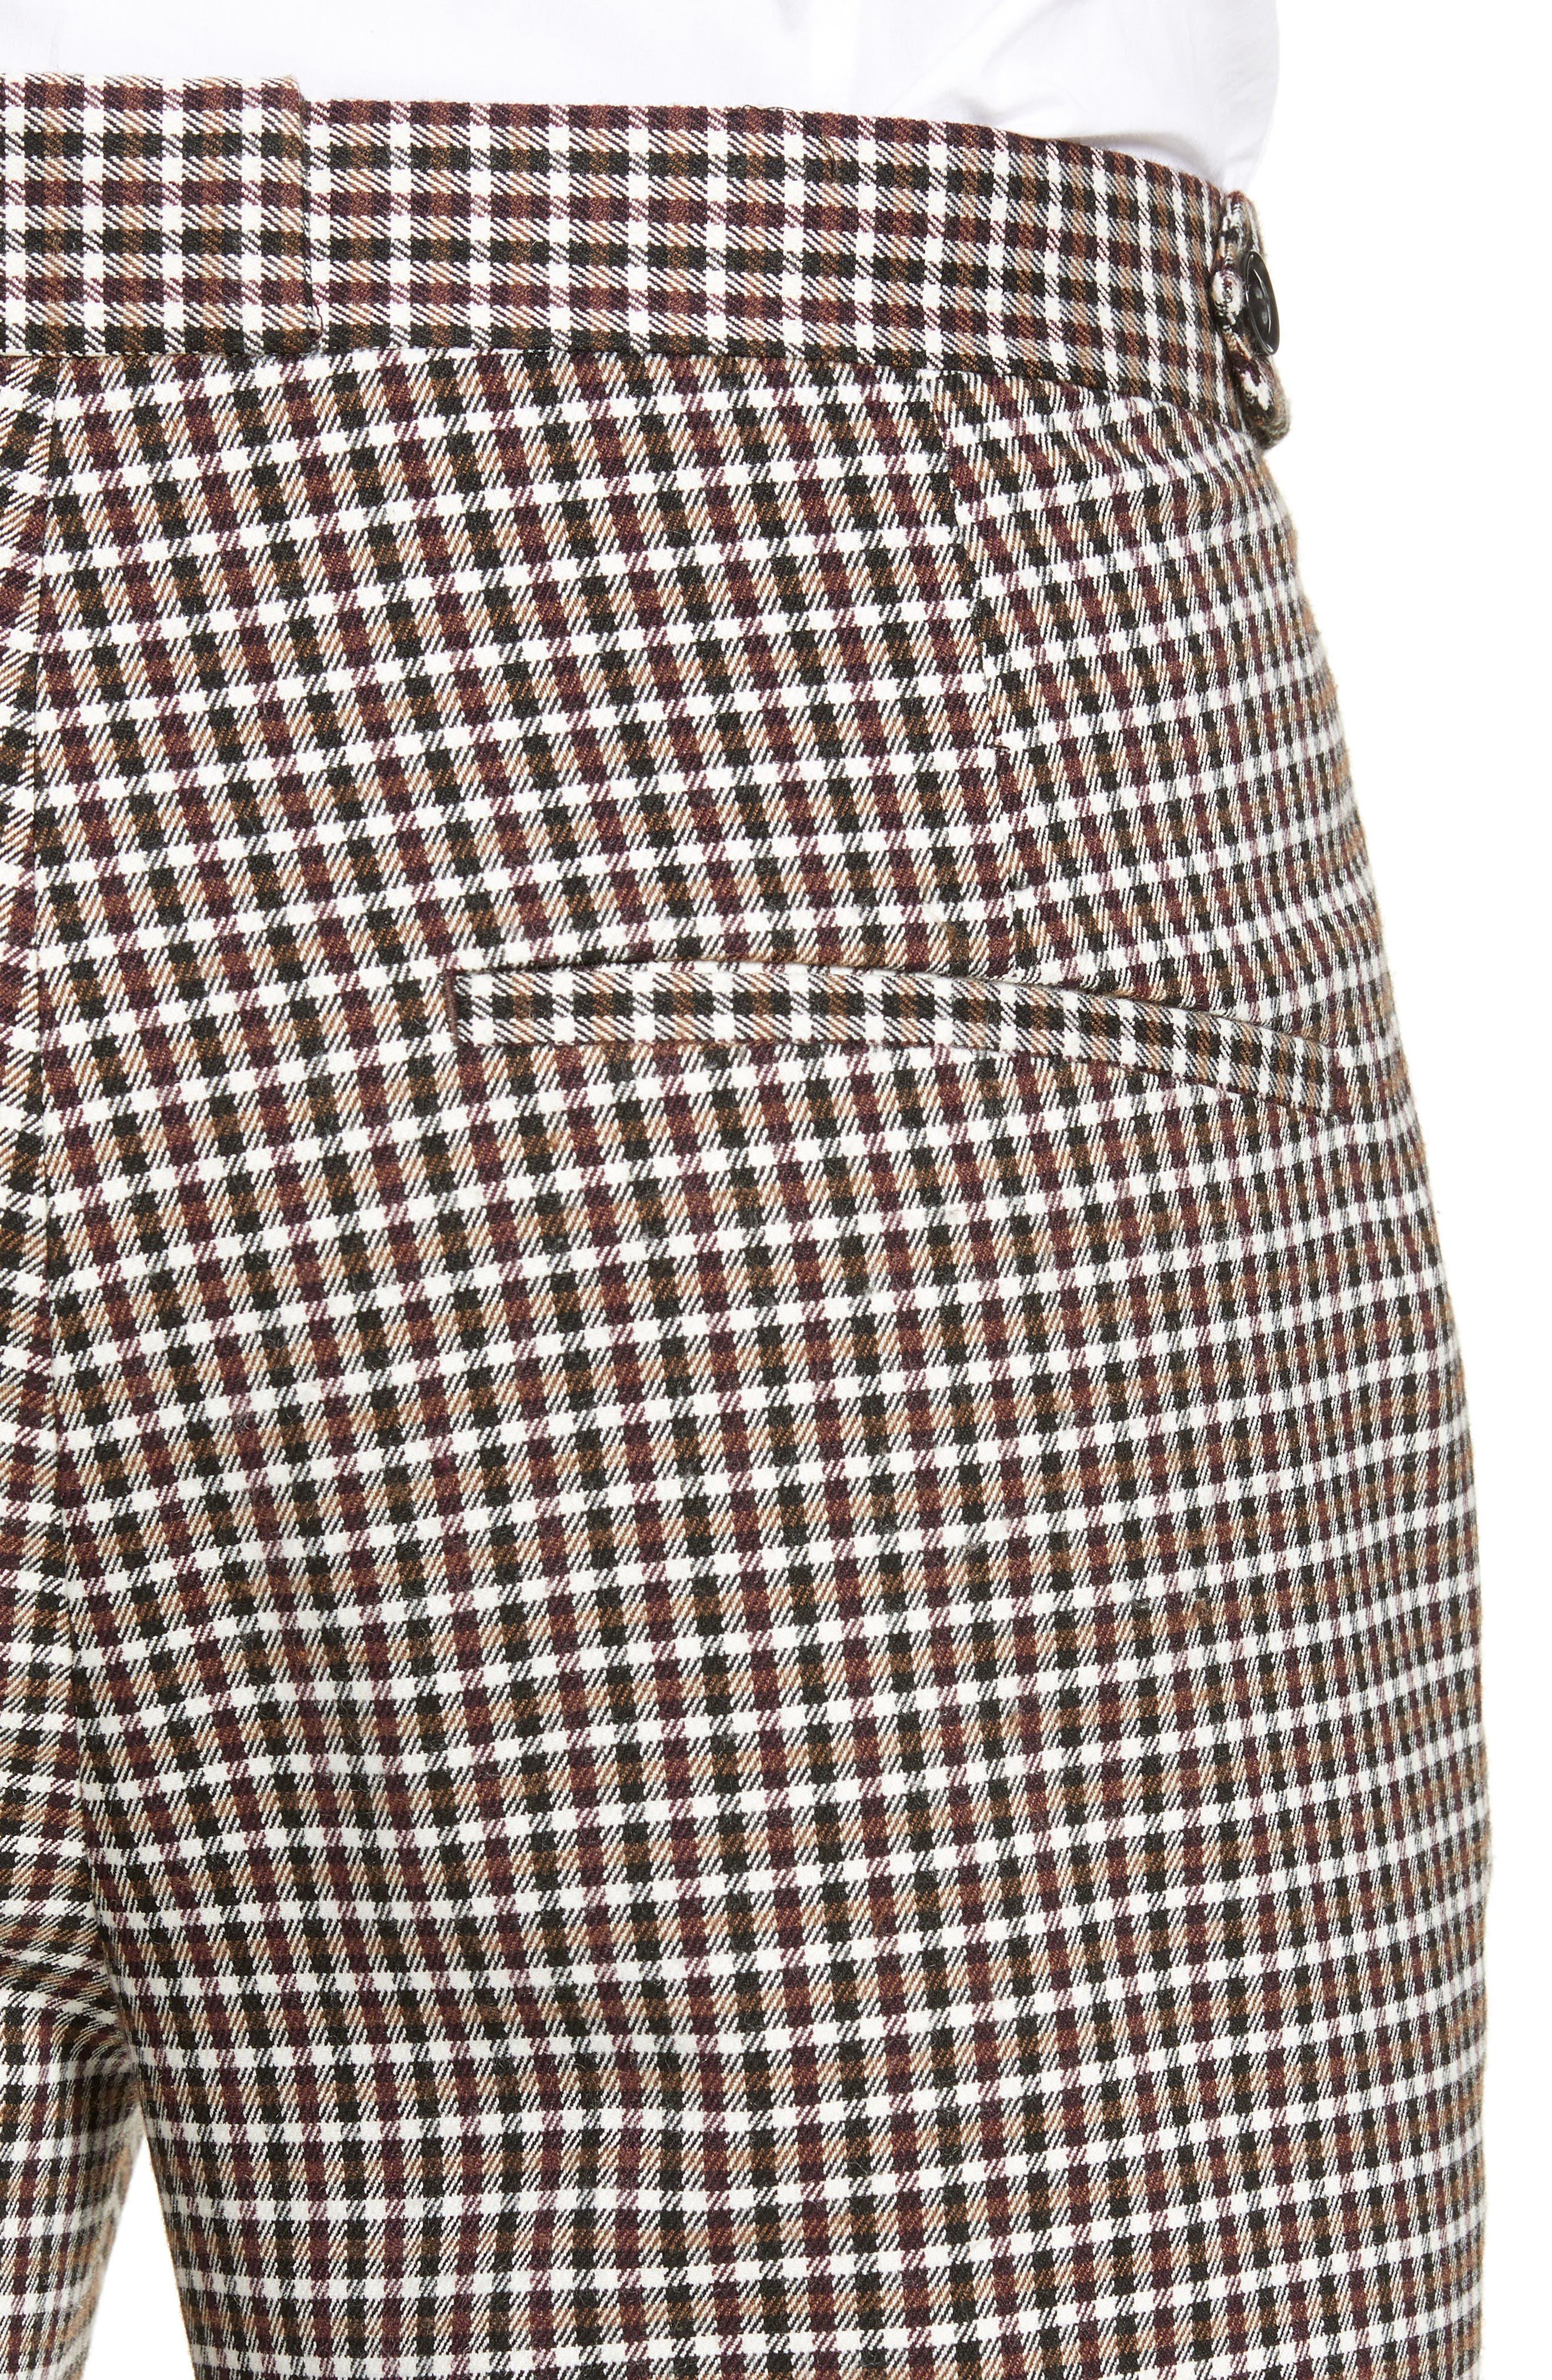 TOPMAN, Multicheck Skinny Fit Trousers, Alternate thumbnail 4, color, BLACK MULTI